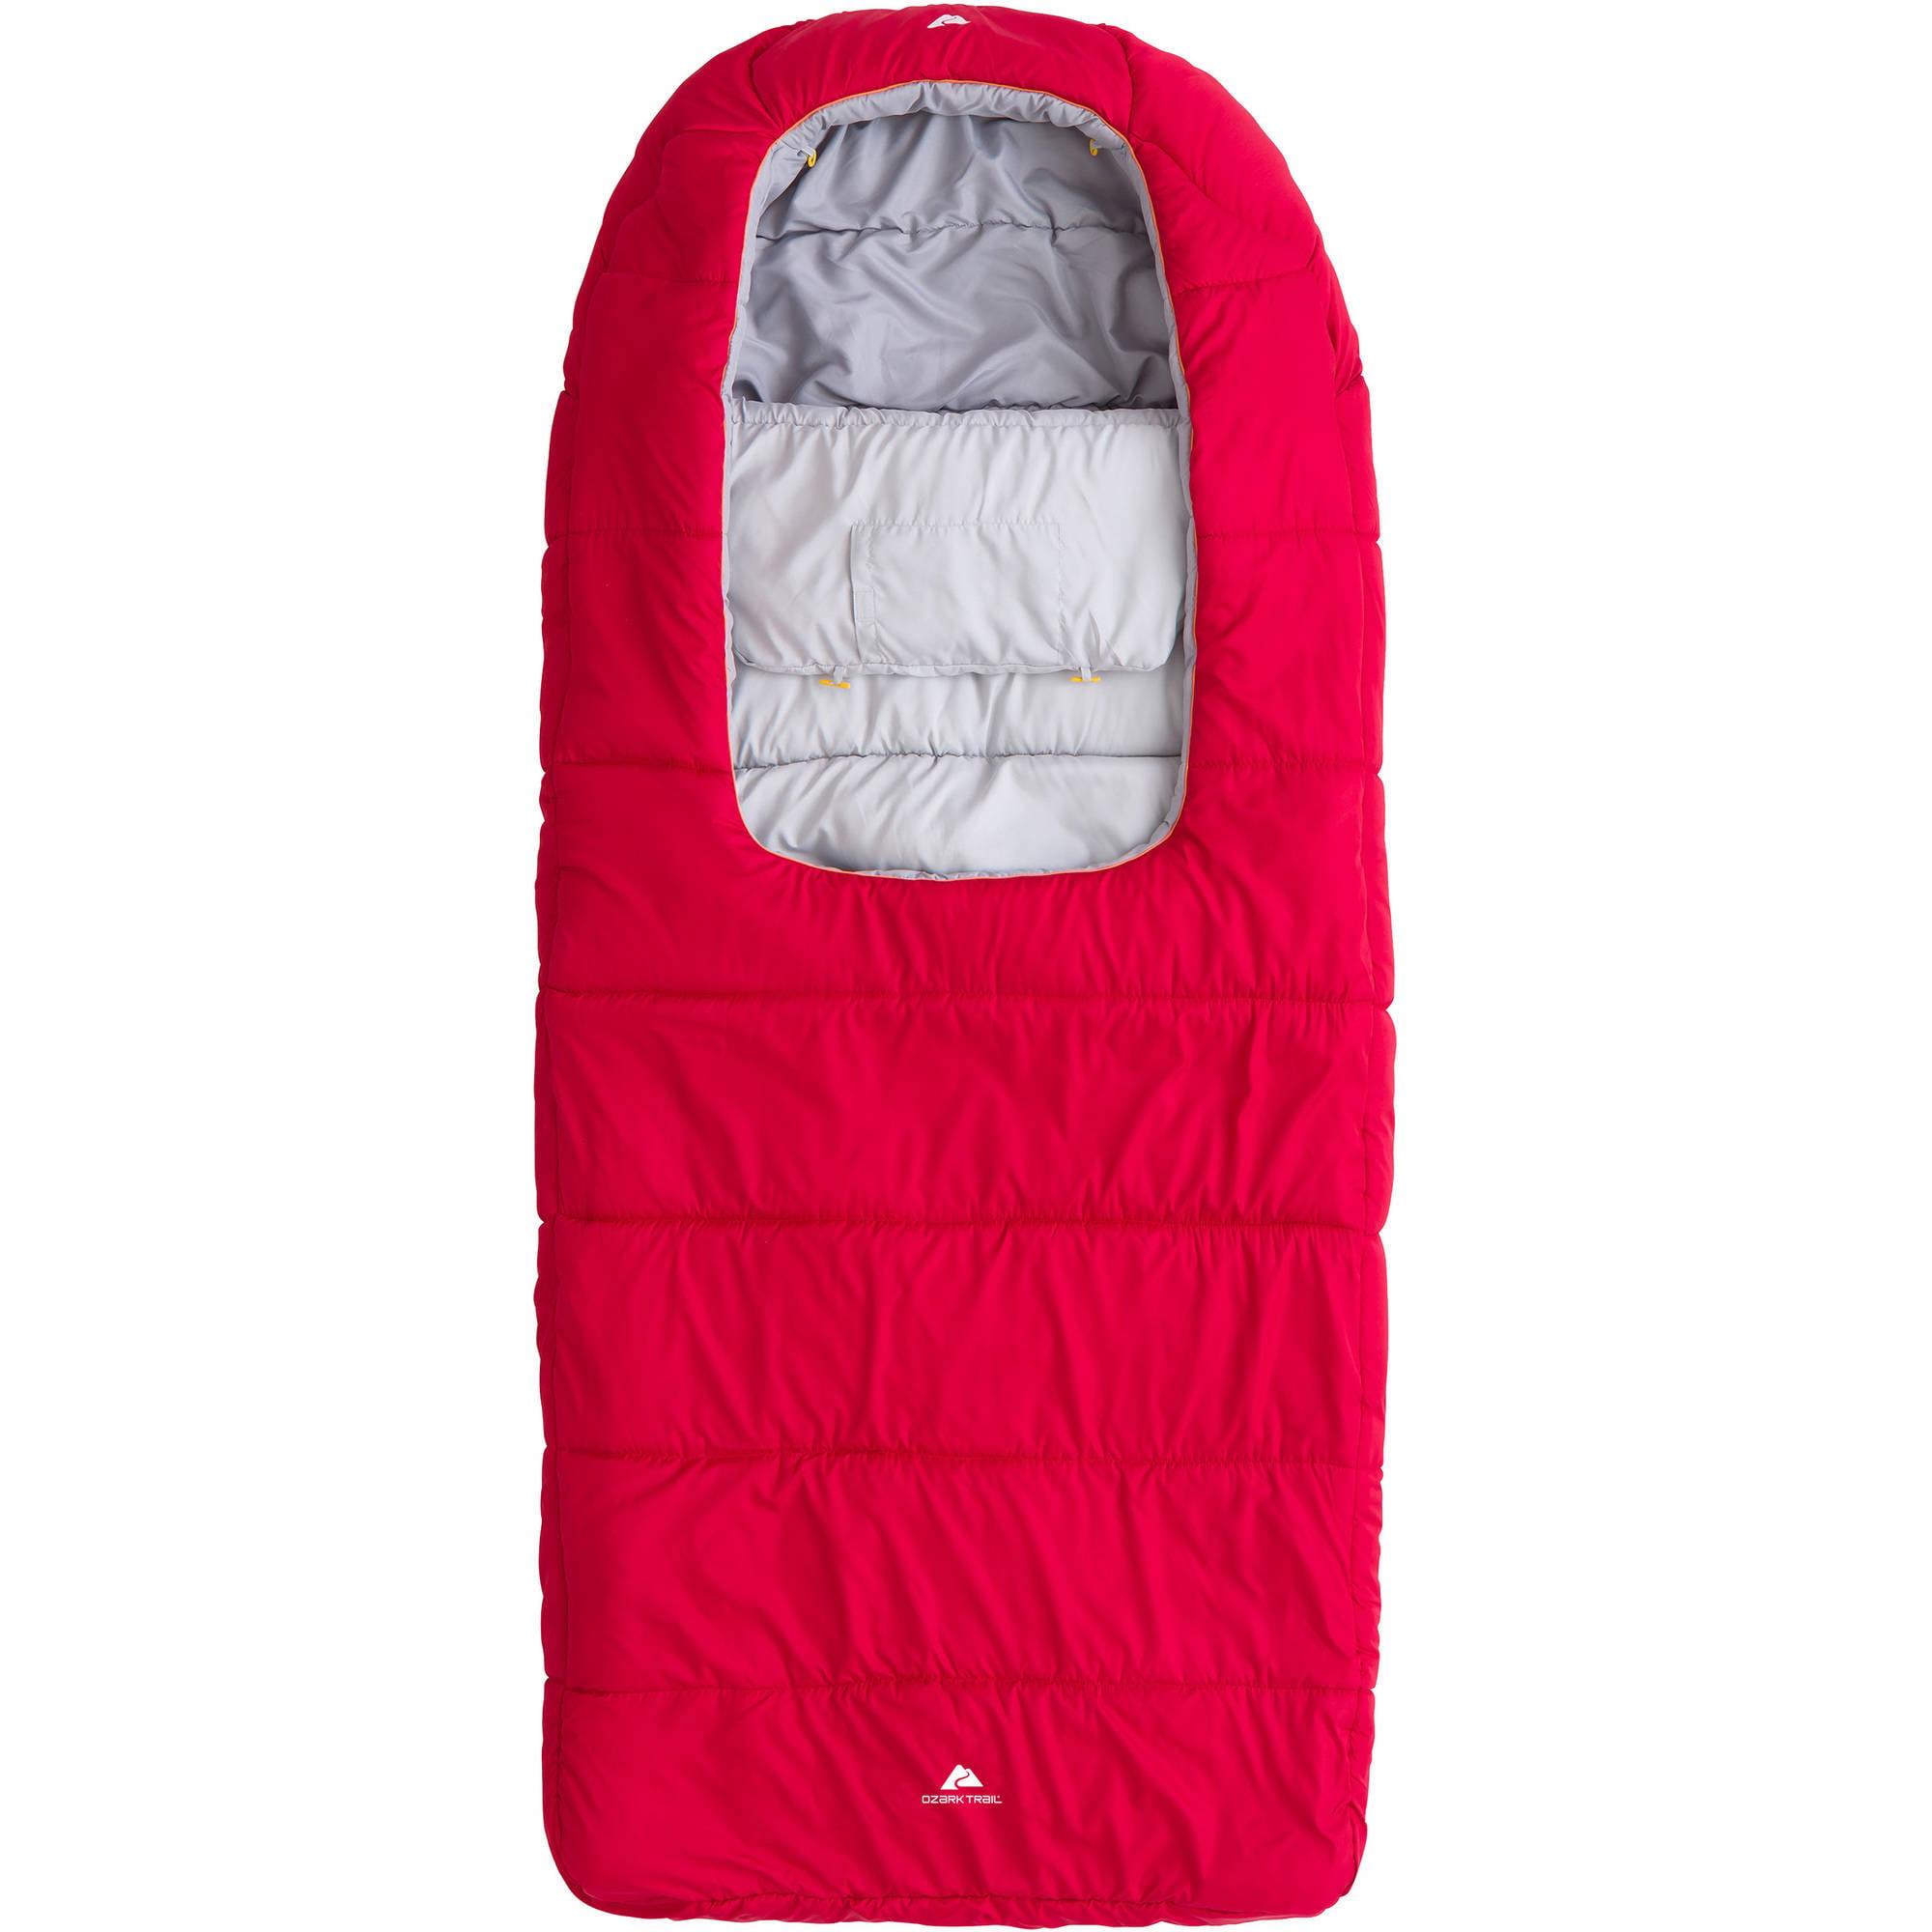 Ozark Trail 40F Zipperless Sleeping Bag With Comforter by EUSEBIO SPORTING CO.,LTD